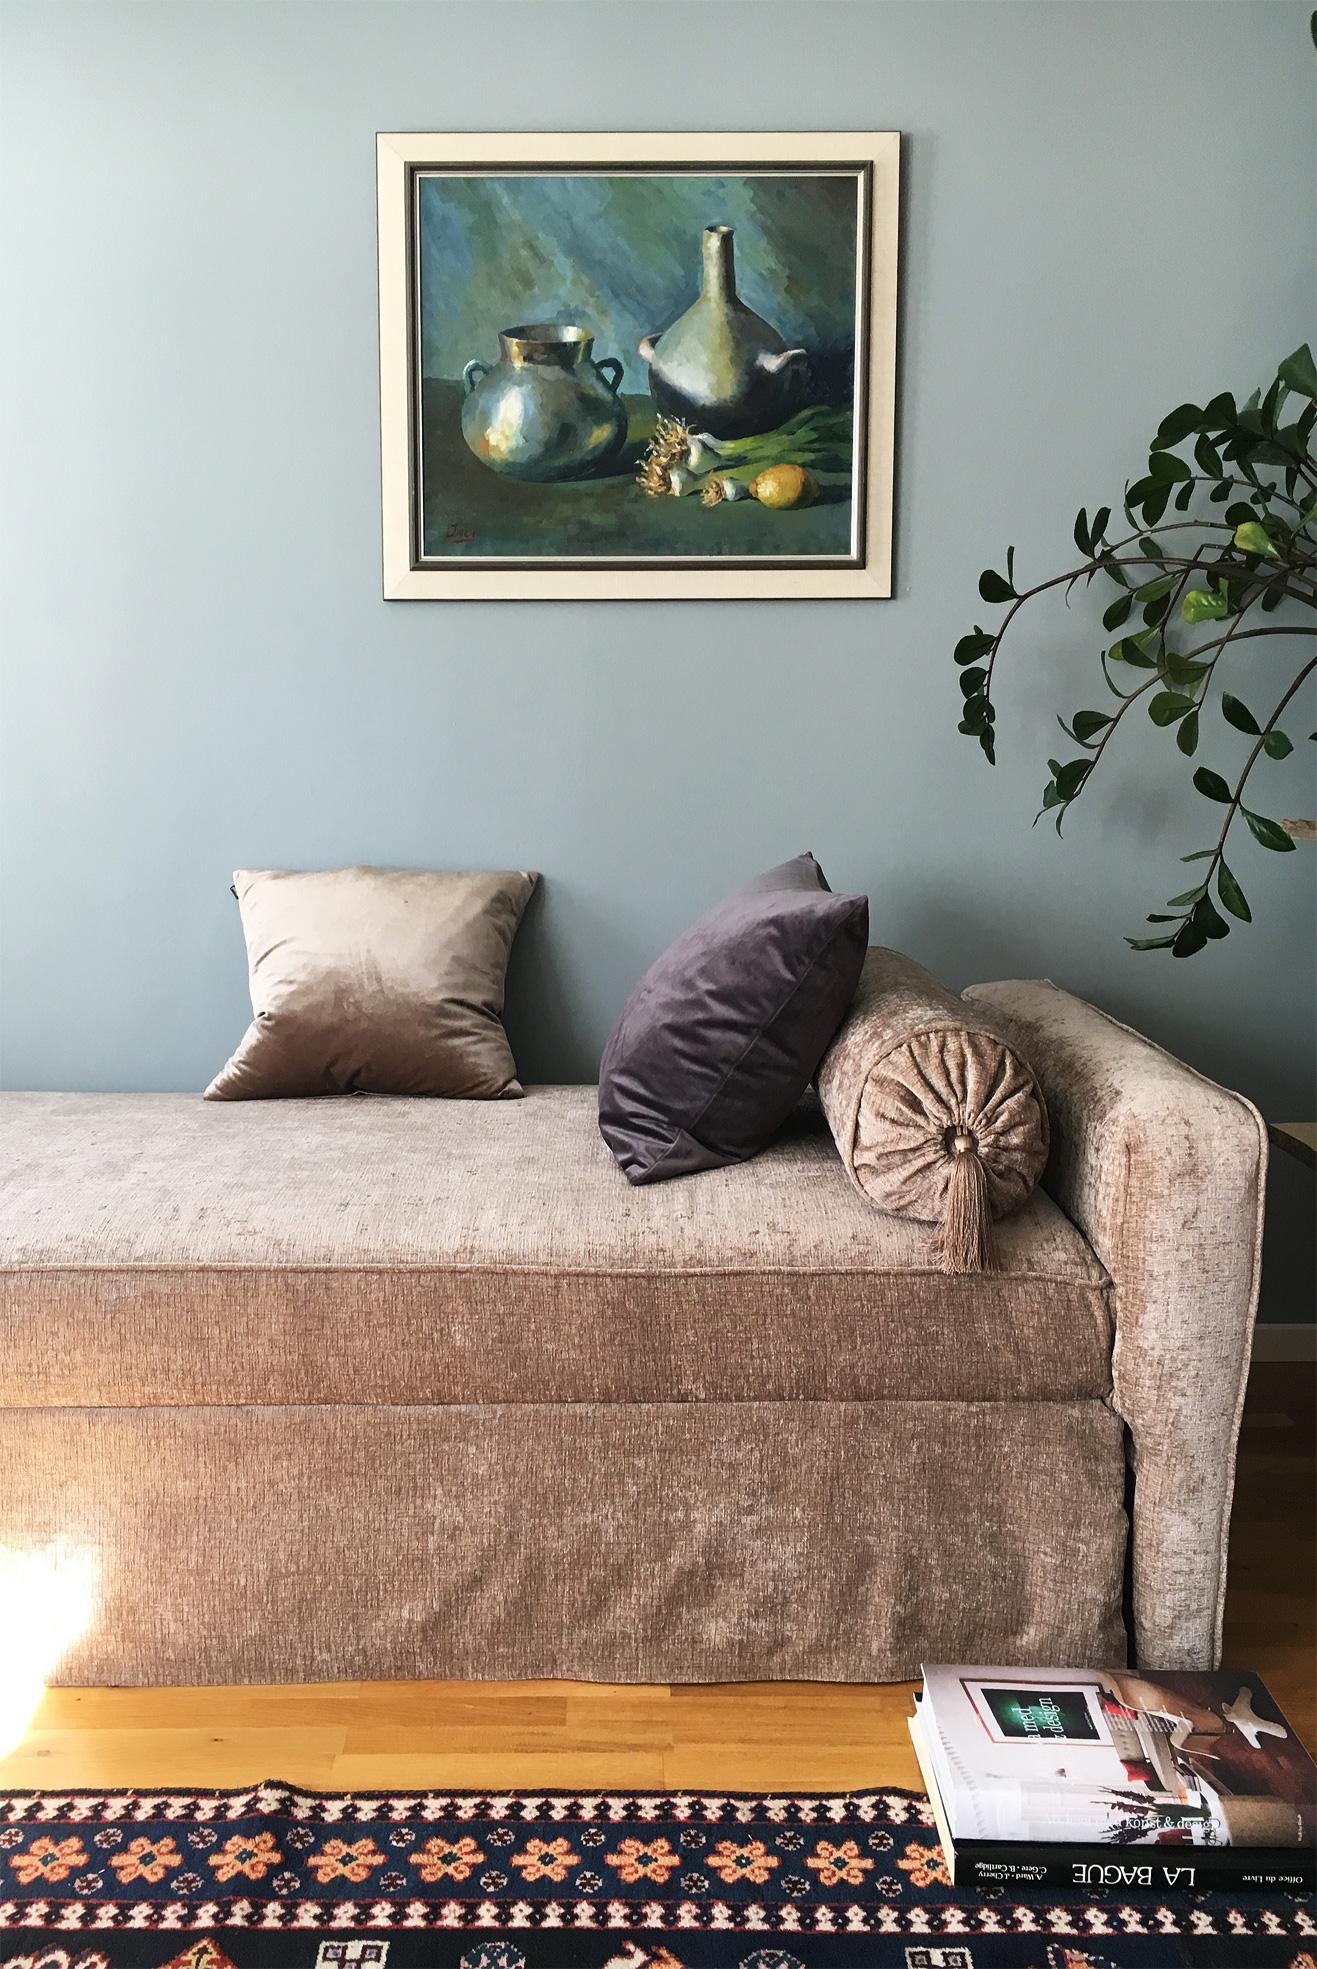 Velvet, sammet, cushions kuddar, sofa, soffa, daybed, dagbädd